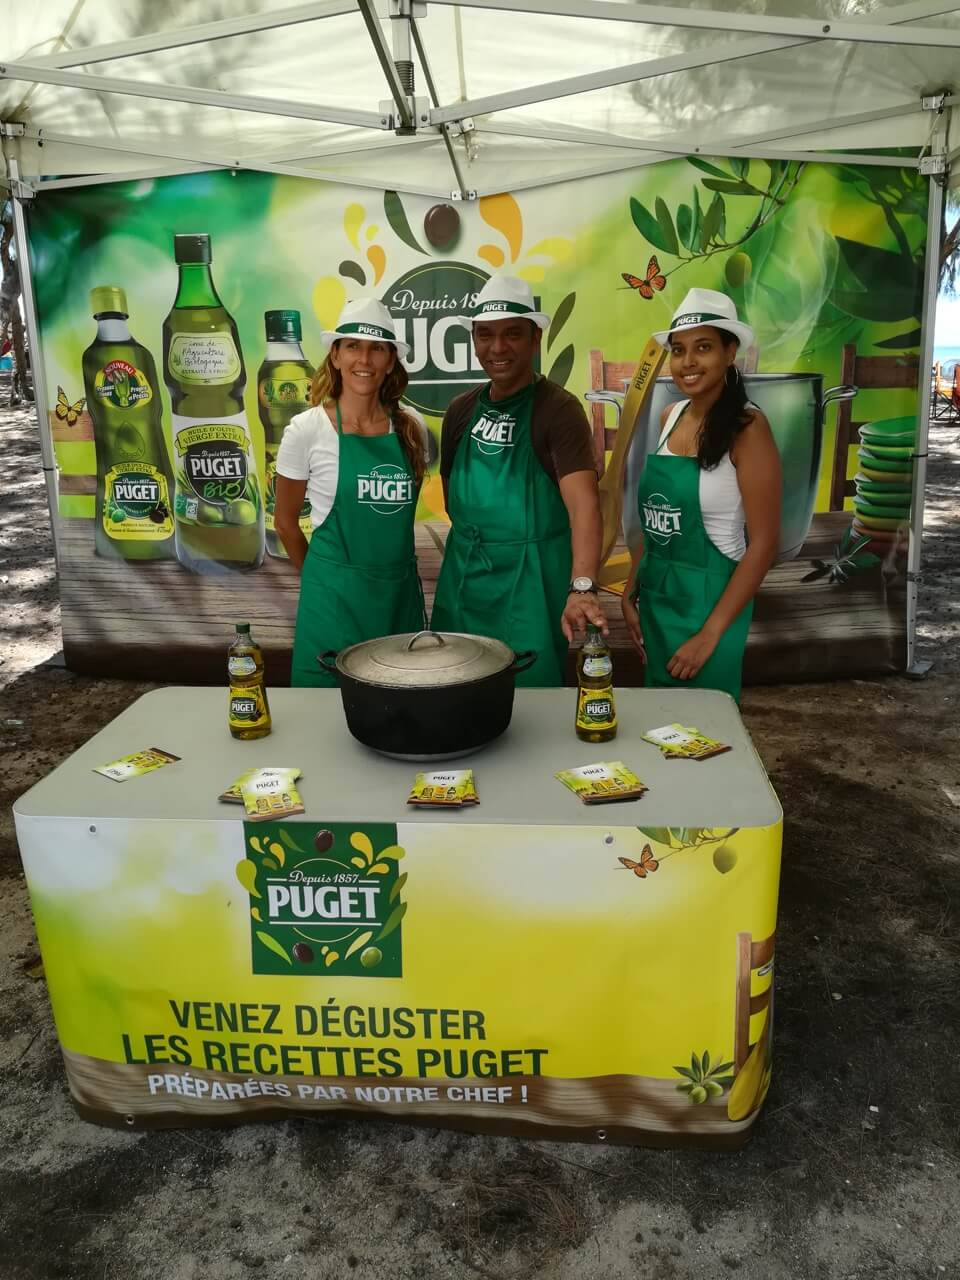 JDF-Puget-trade marketing